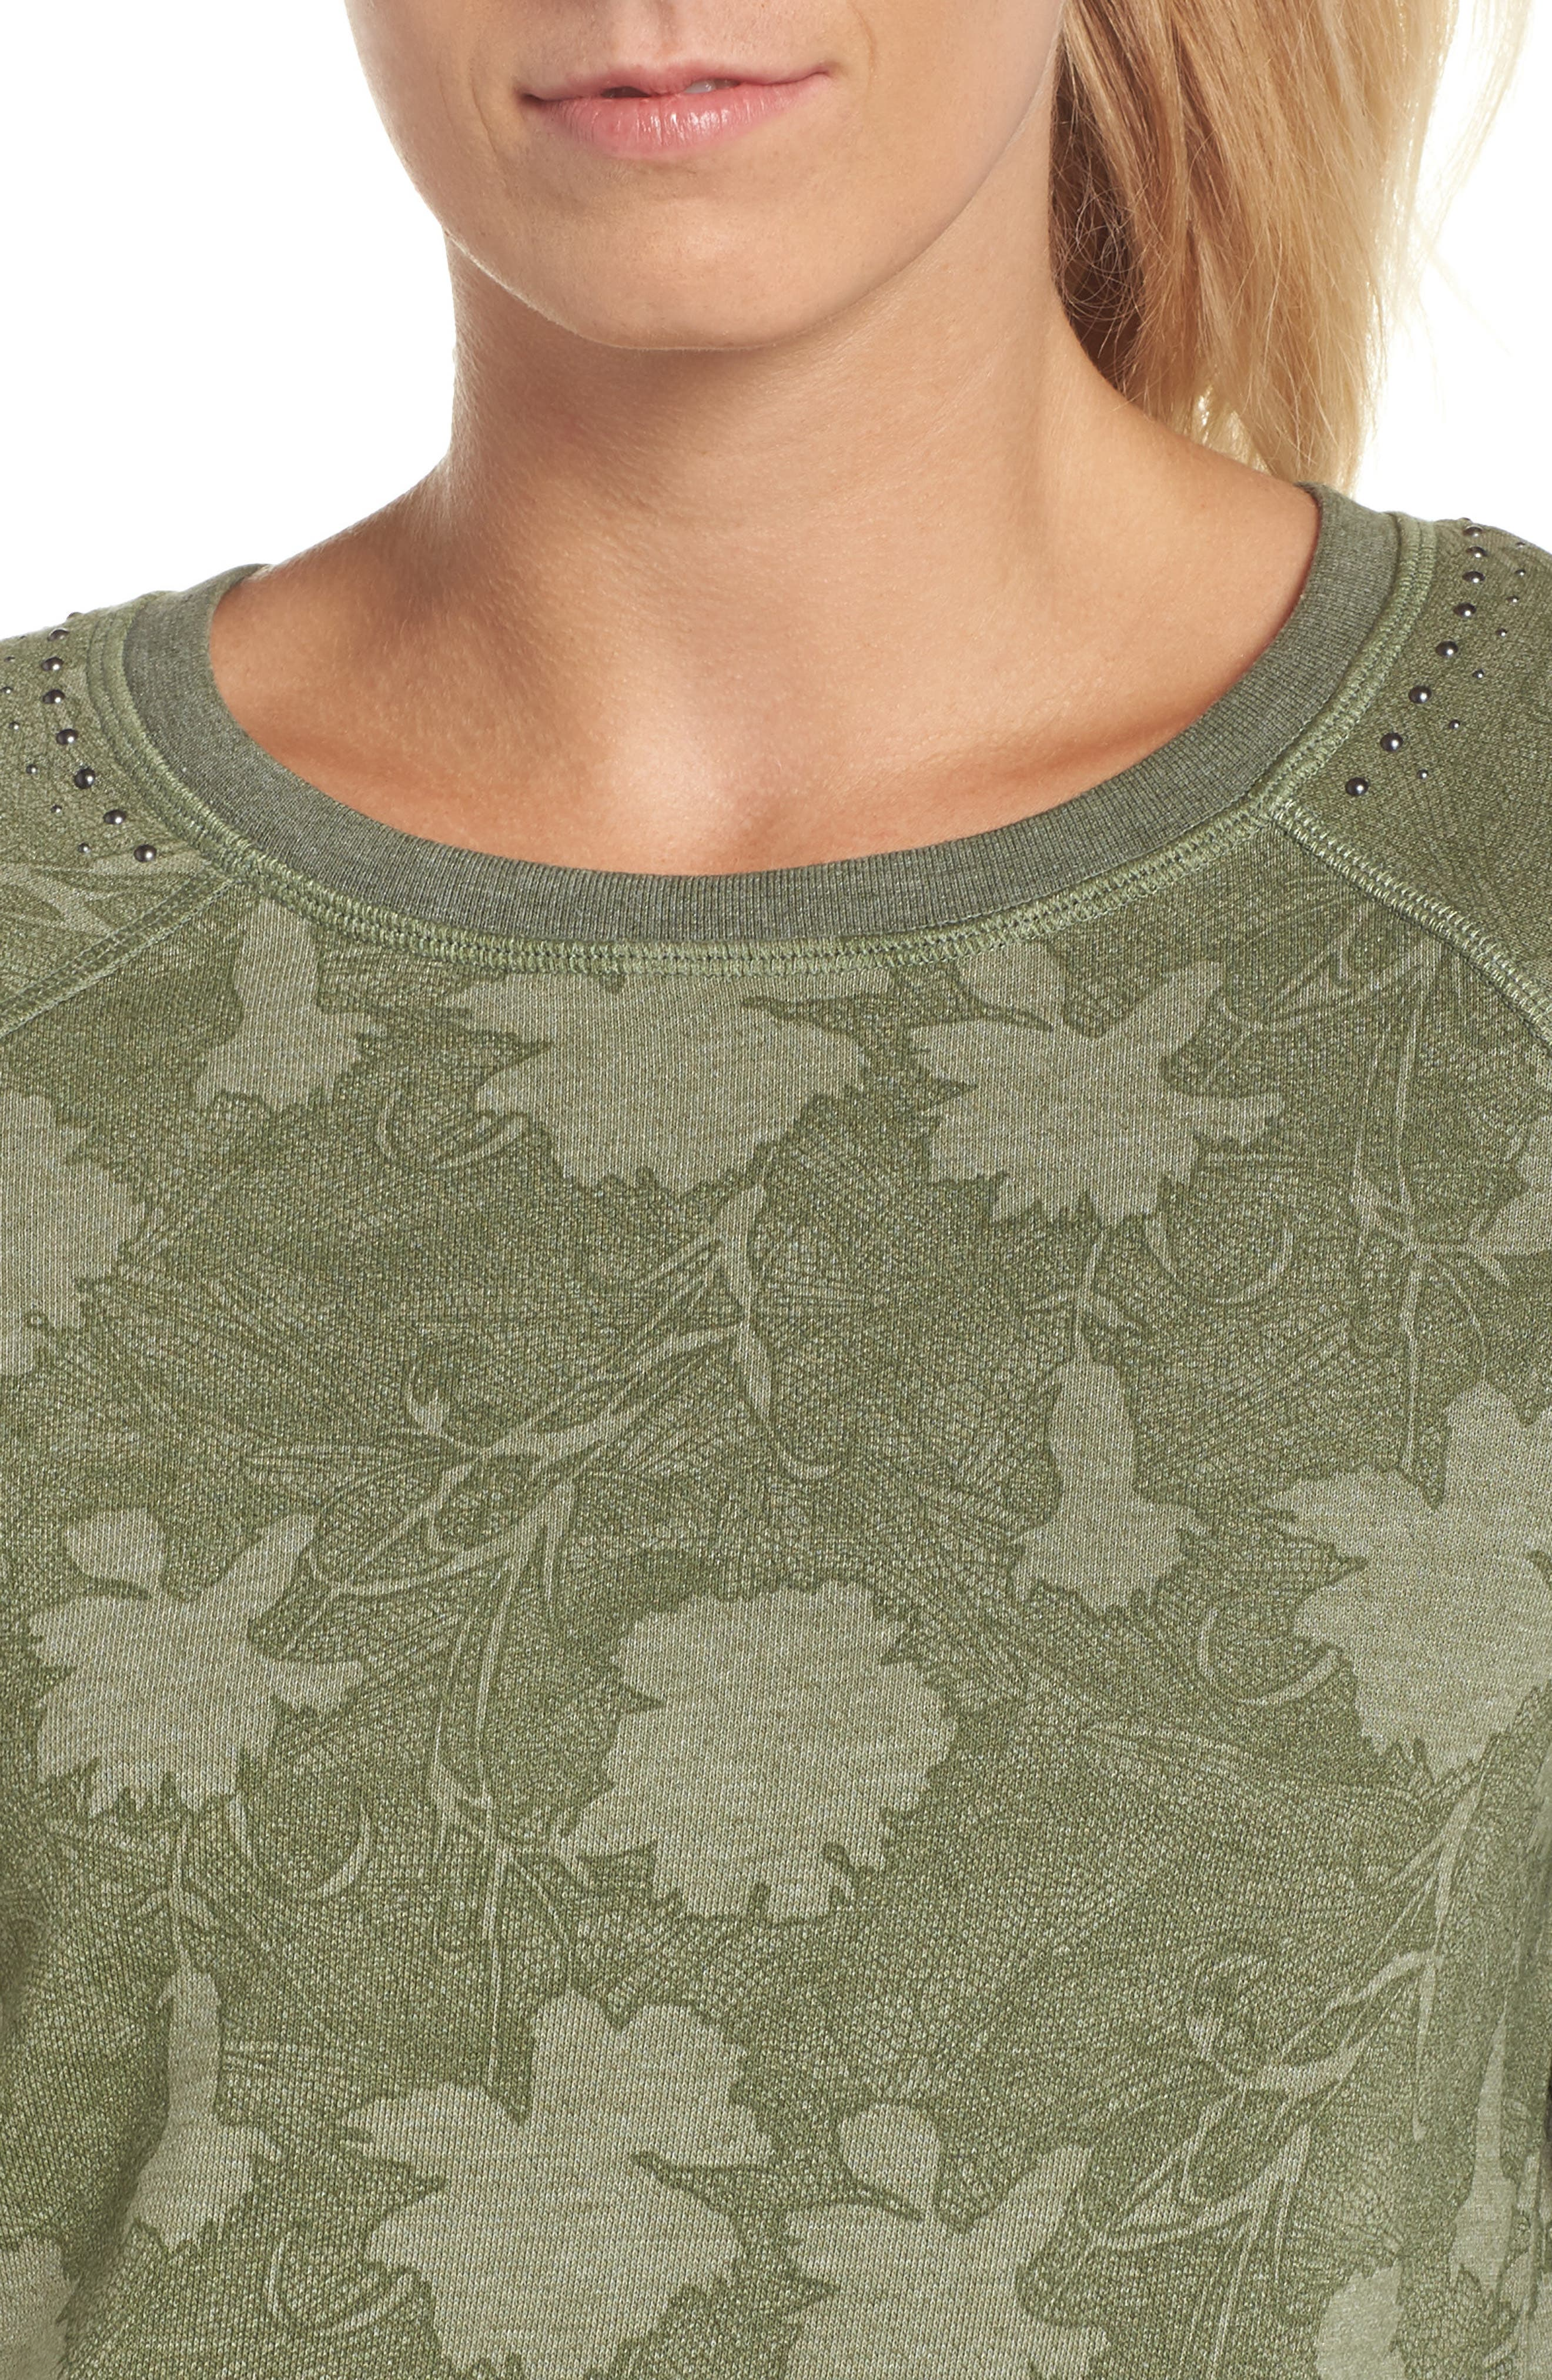 Sleek Leaf Kale Sweatshirt,                             Alternate thumbnail 4, color,                             GREEN